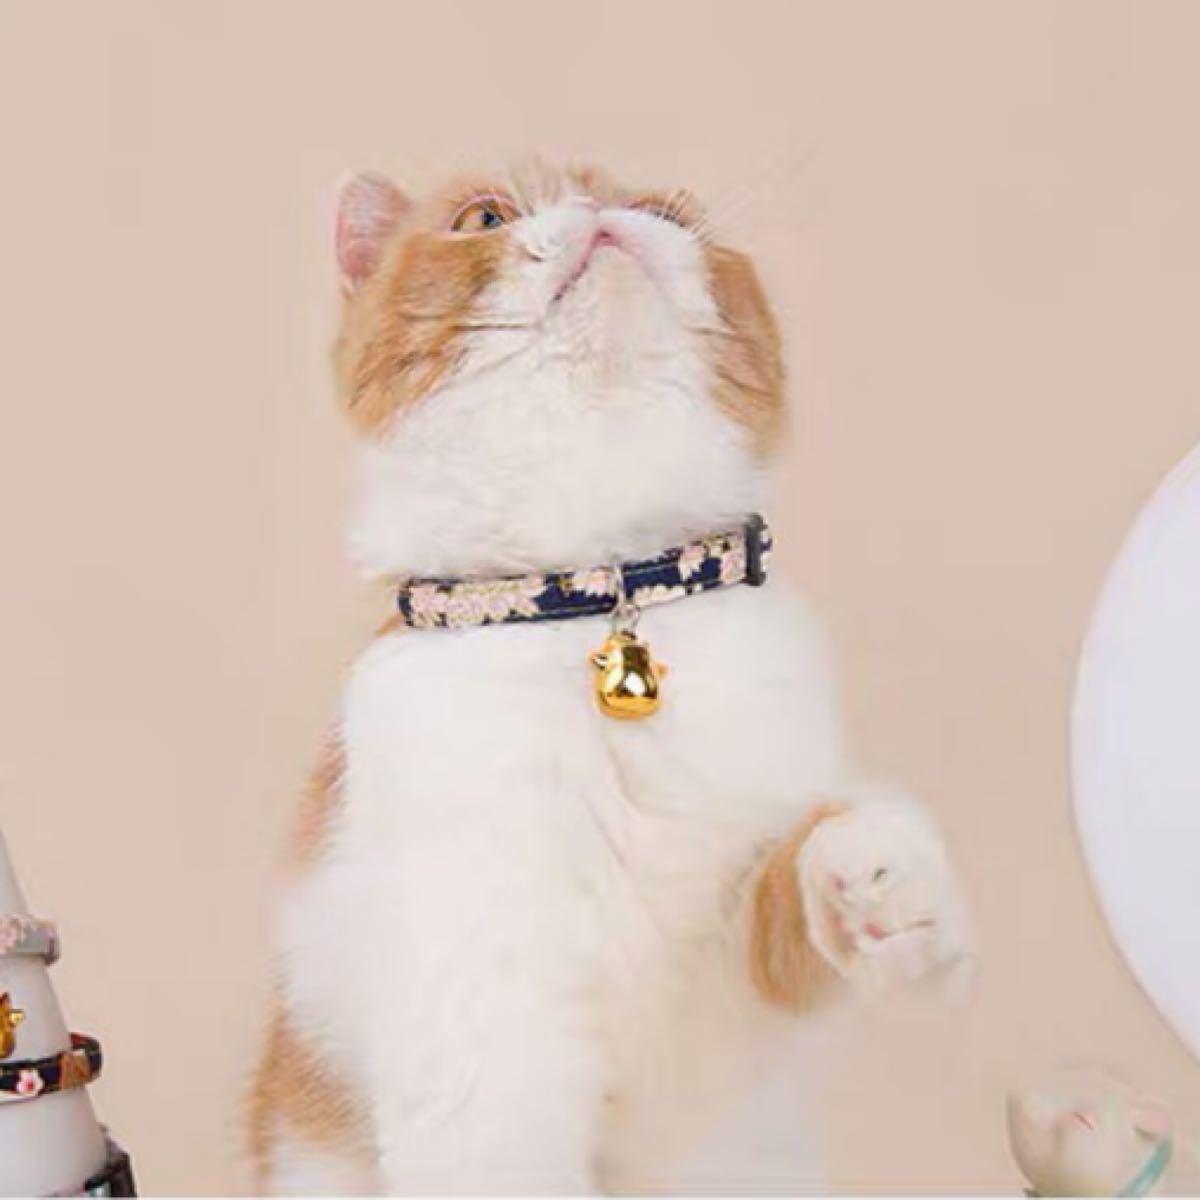 猫用首輪 子犬用首輪 猫用品 犬用品 ペット用首輪 ペット用品